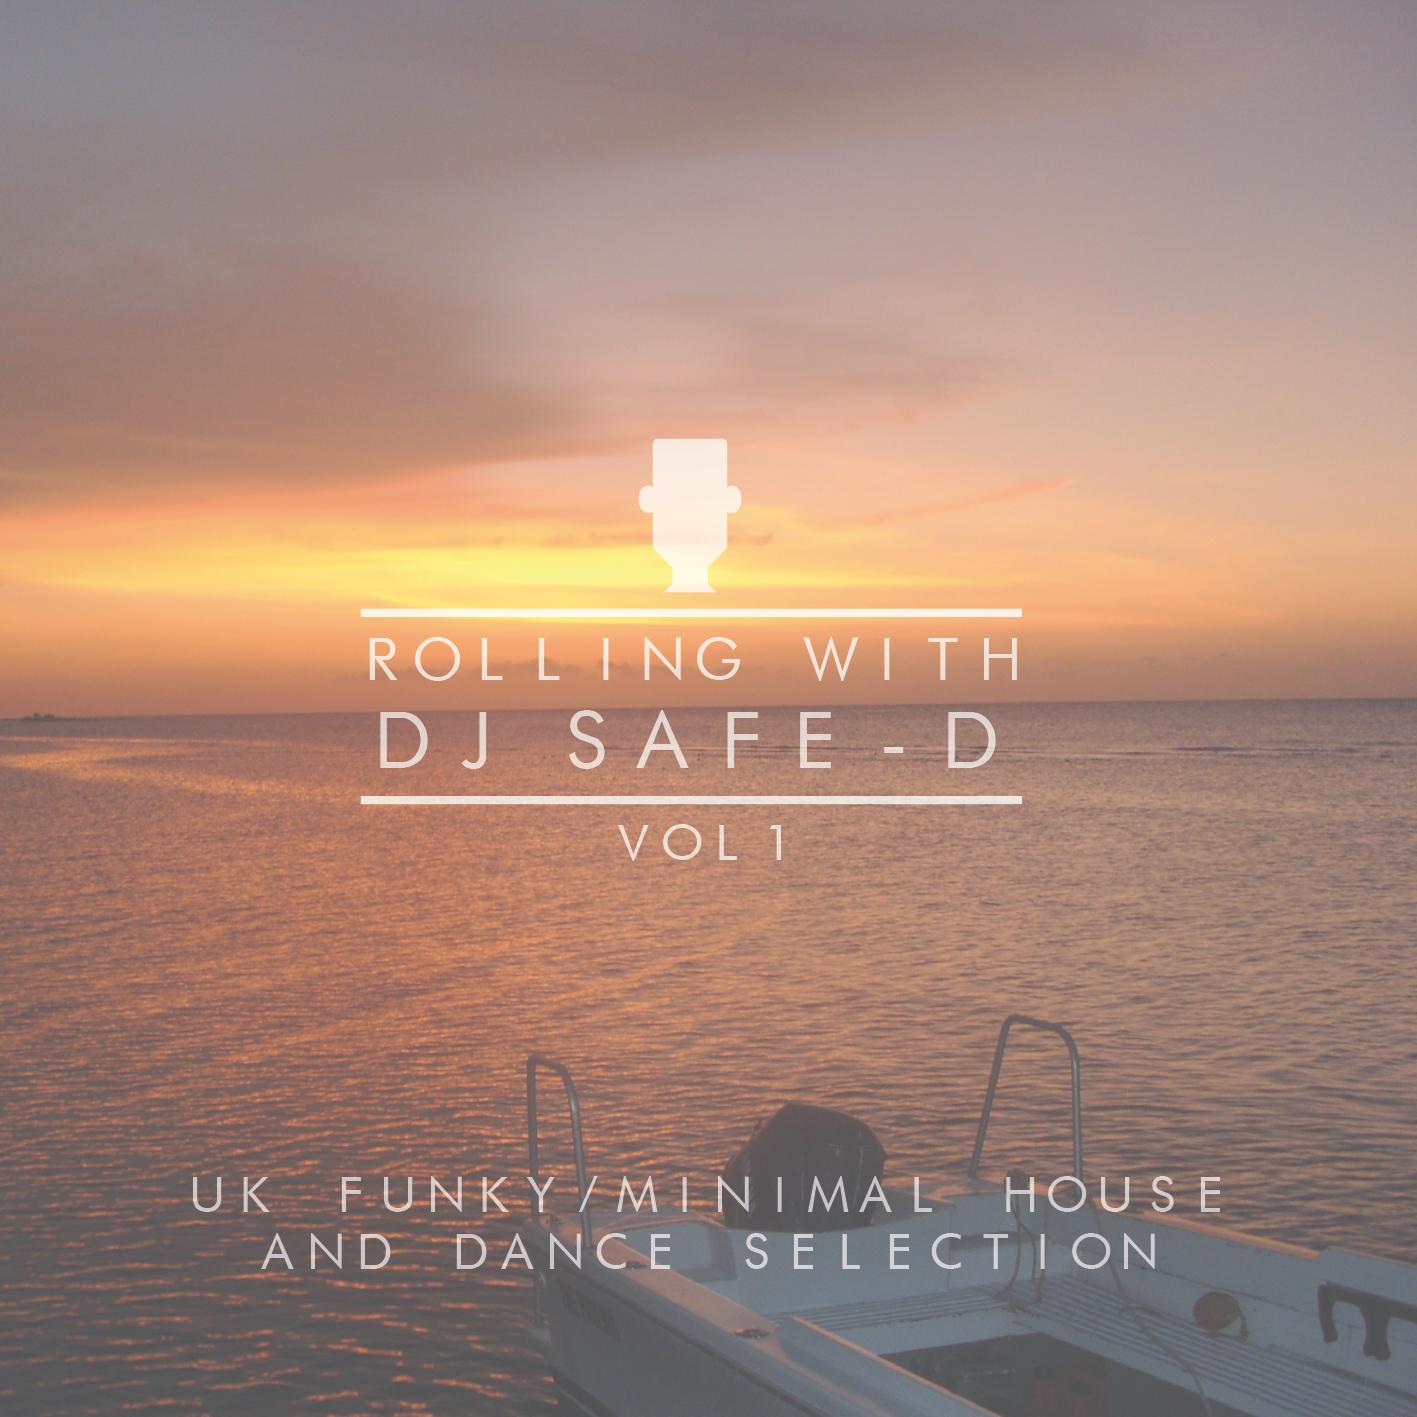 DJ Safe-D - Rolling Vol.1 - sea pic